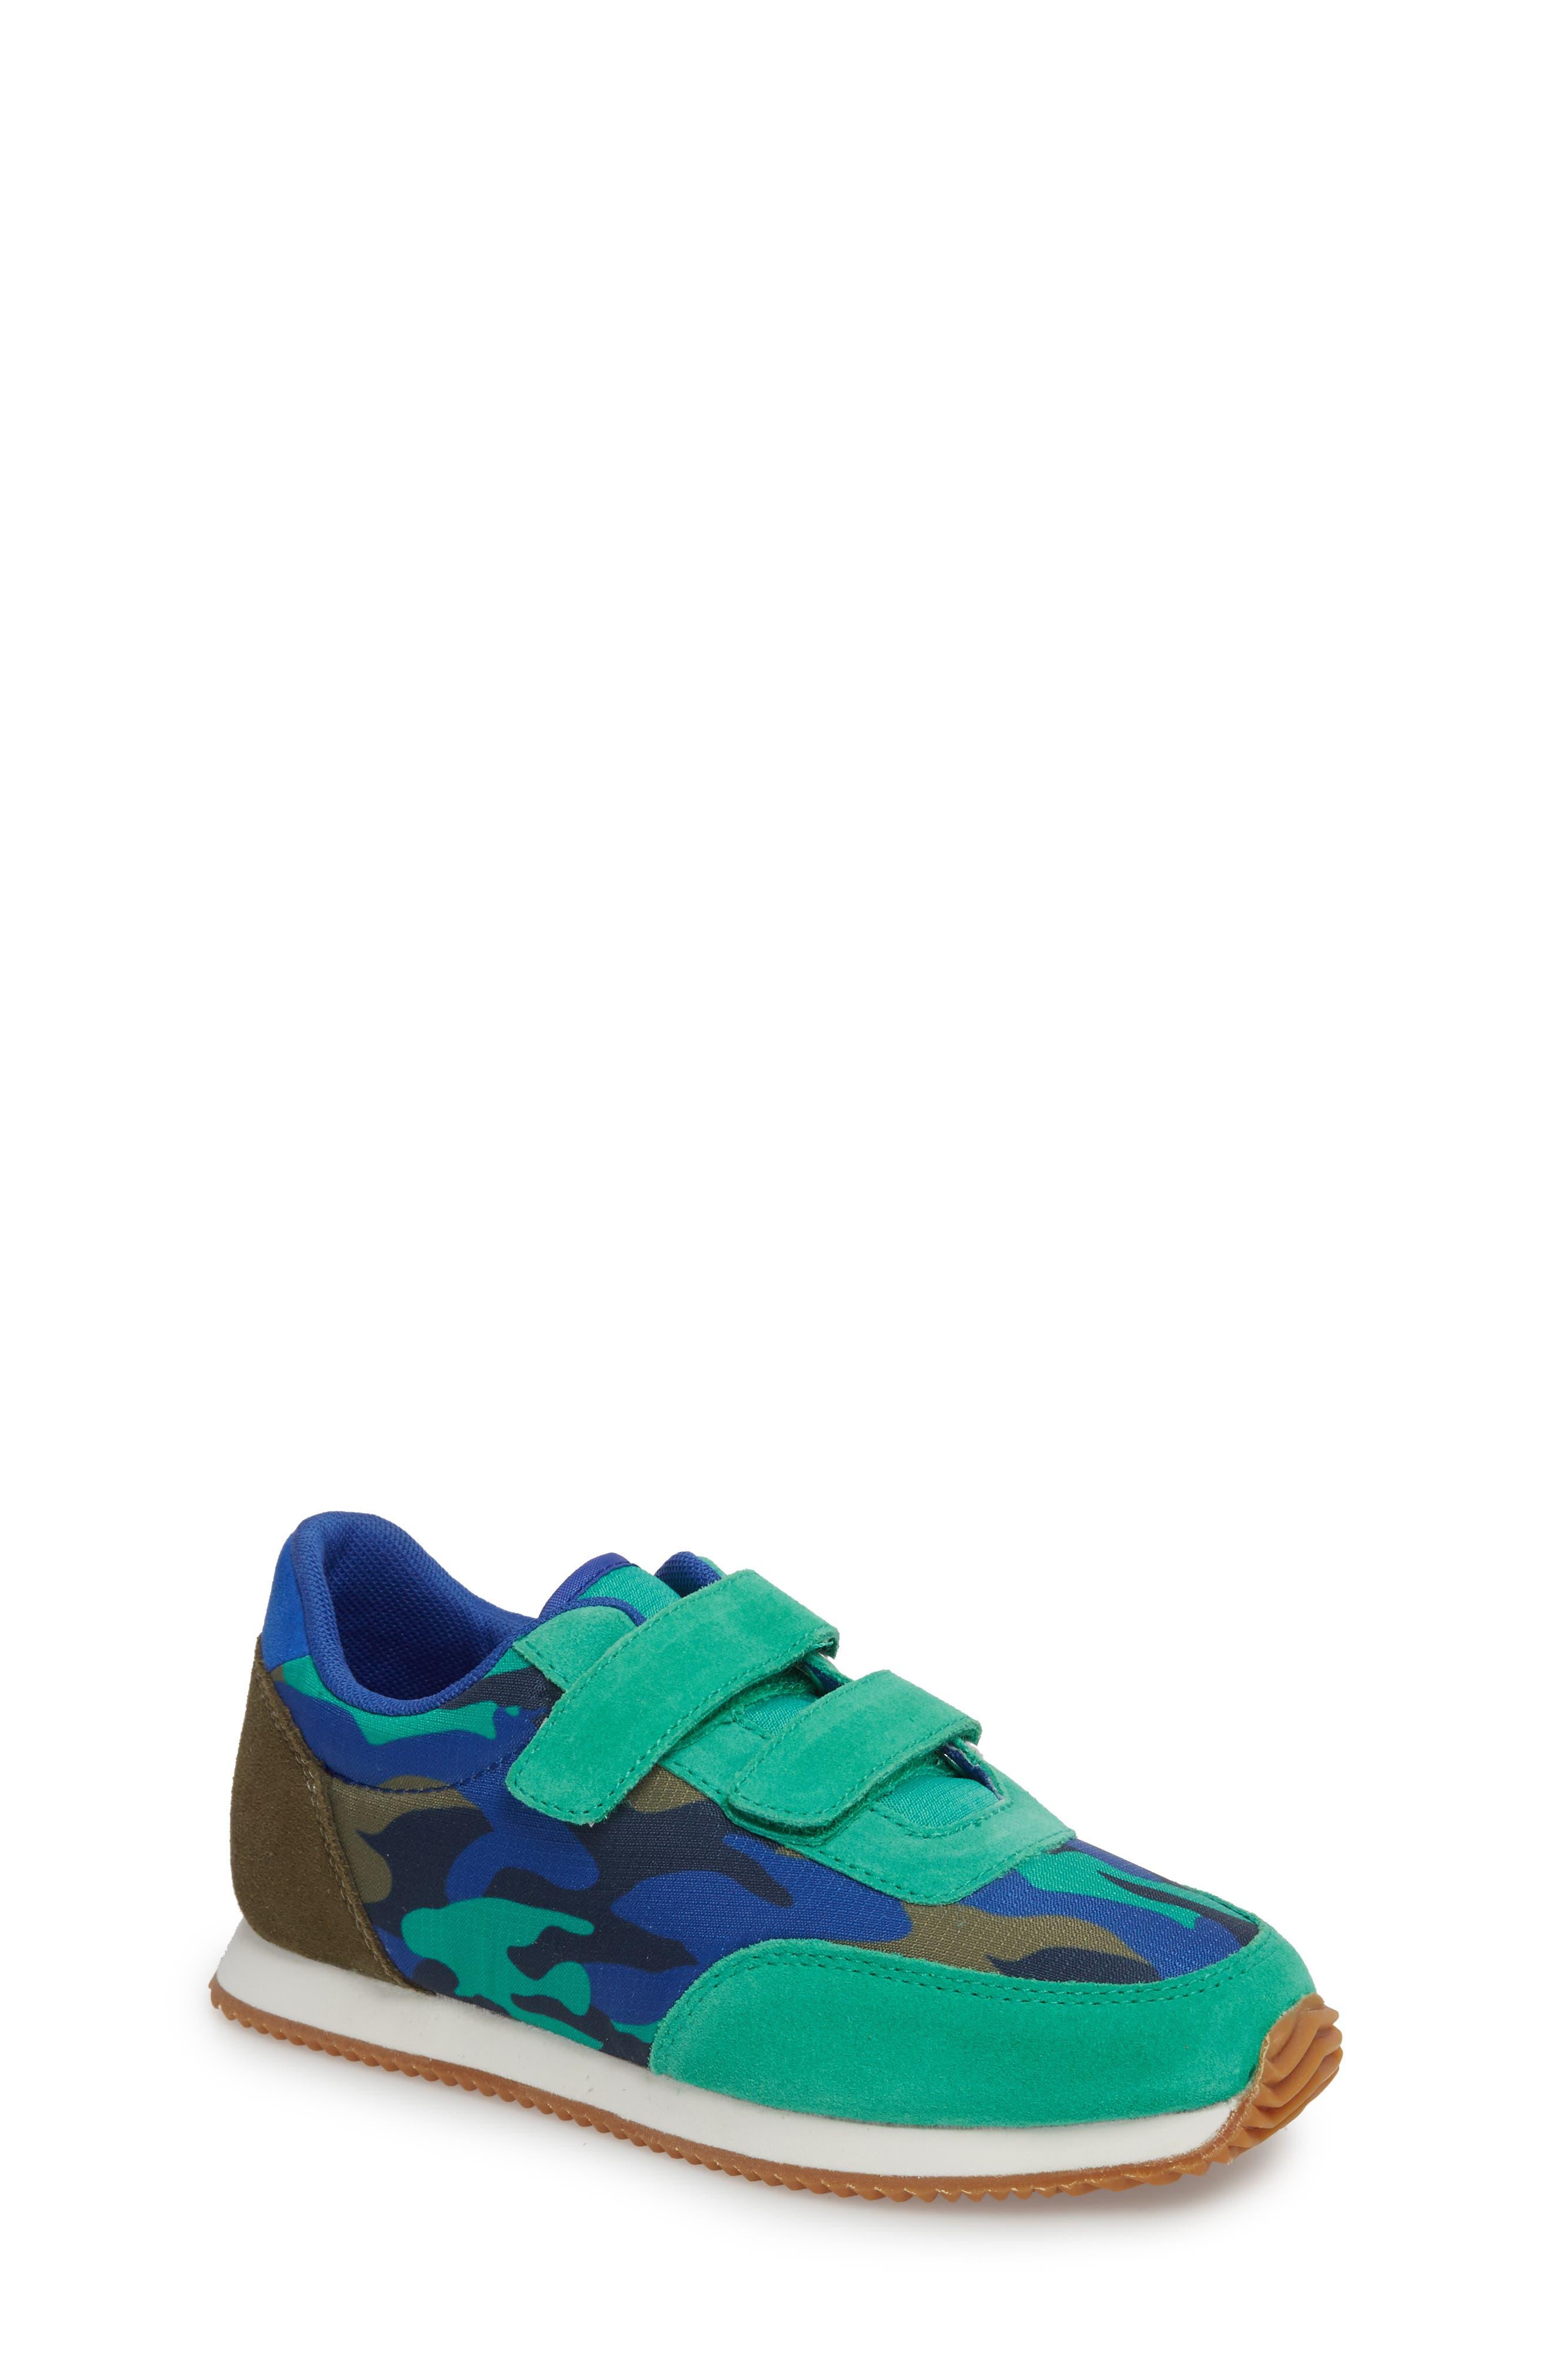 Print Sneakers,                         Main,                         color, Astro Green